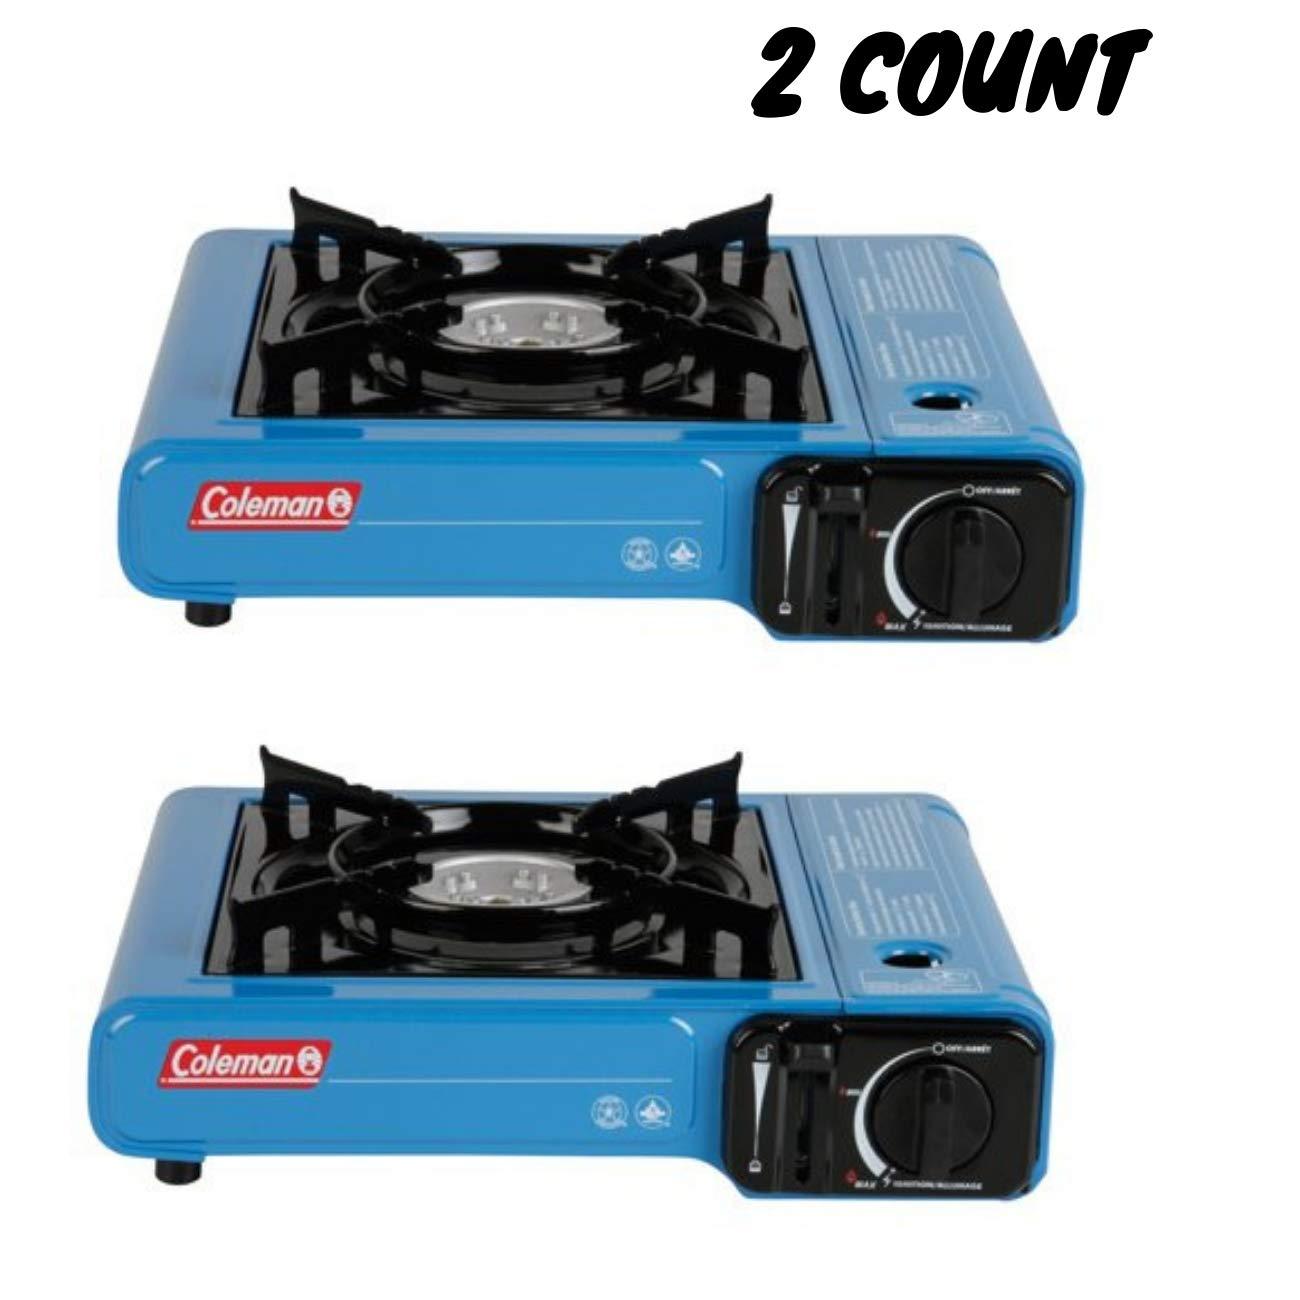 Amazon.com: Coleman 1-Burner Tabletop Butane Camp Stove / 2- Pack: Home Improvement